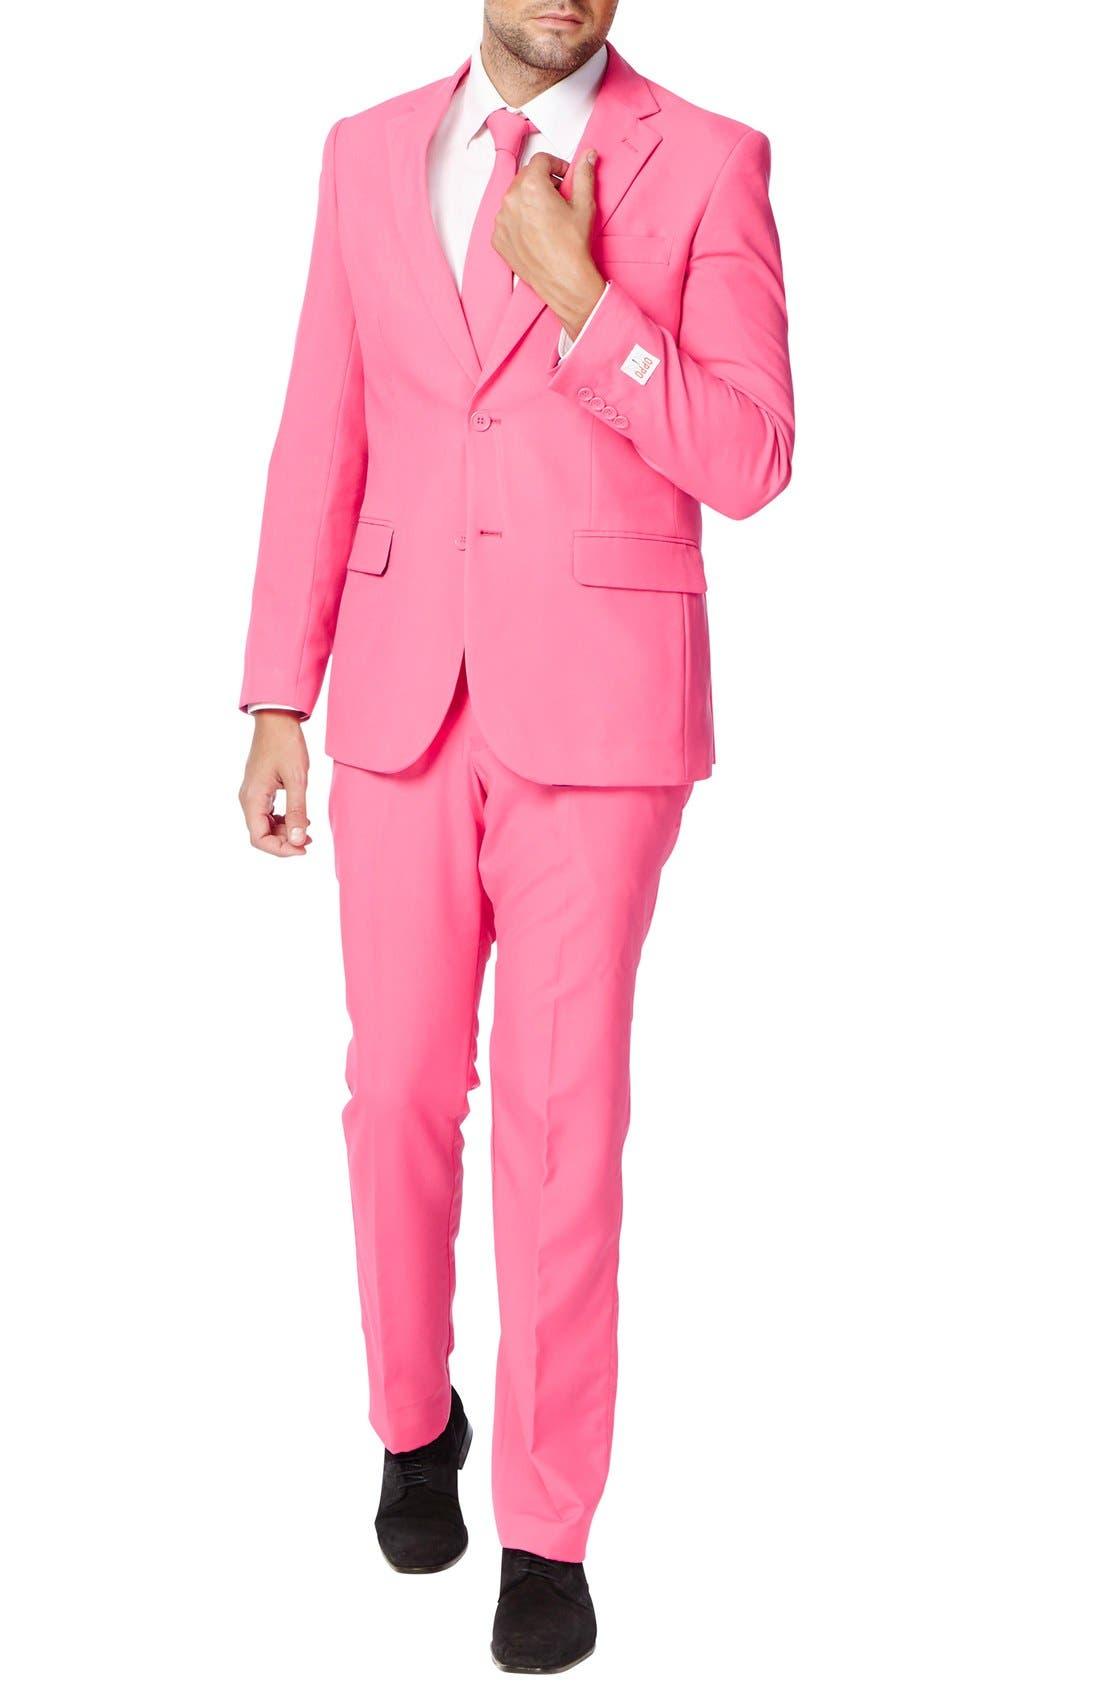 'Mr. Pink' Trim Fit Two-Piece Suit with Tie,                             Alternate thumbnail 4, color,                             650